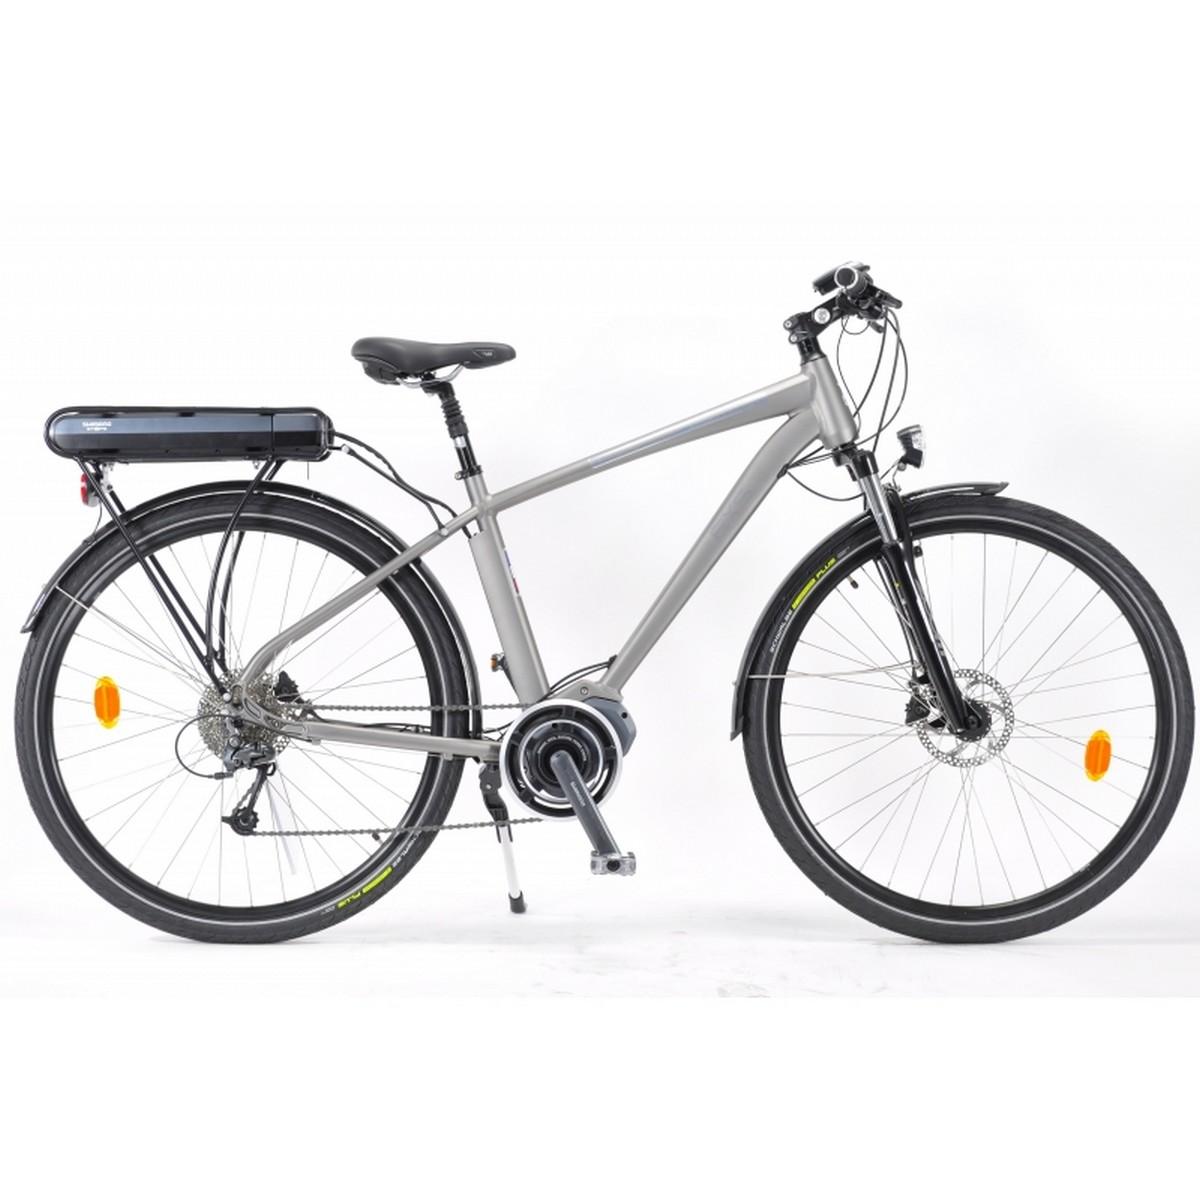 vtc electrique exs bike e manhattan fabrication fran aise. Black Bedroom Furniture Sets. Home Design Ideas